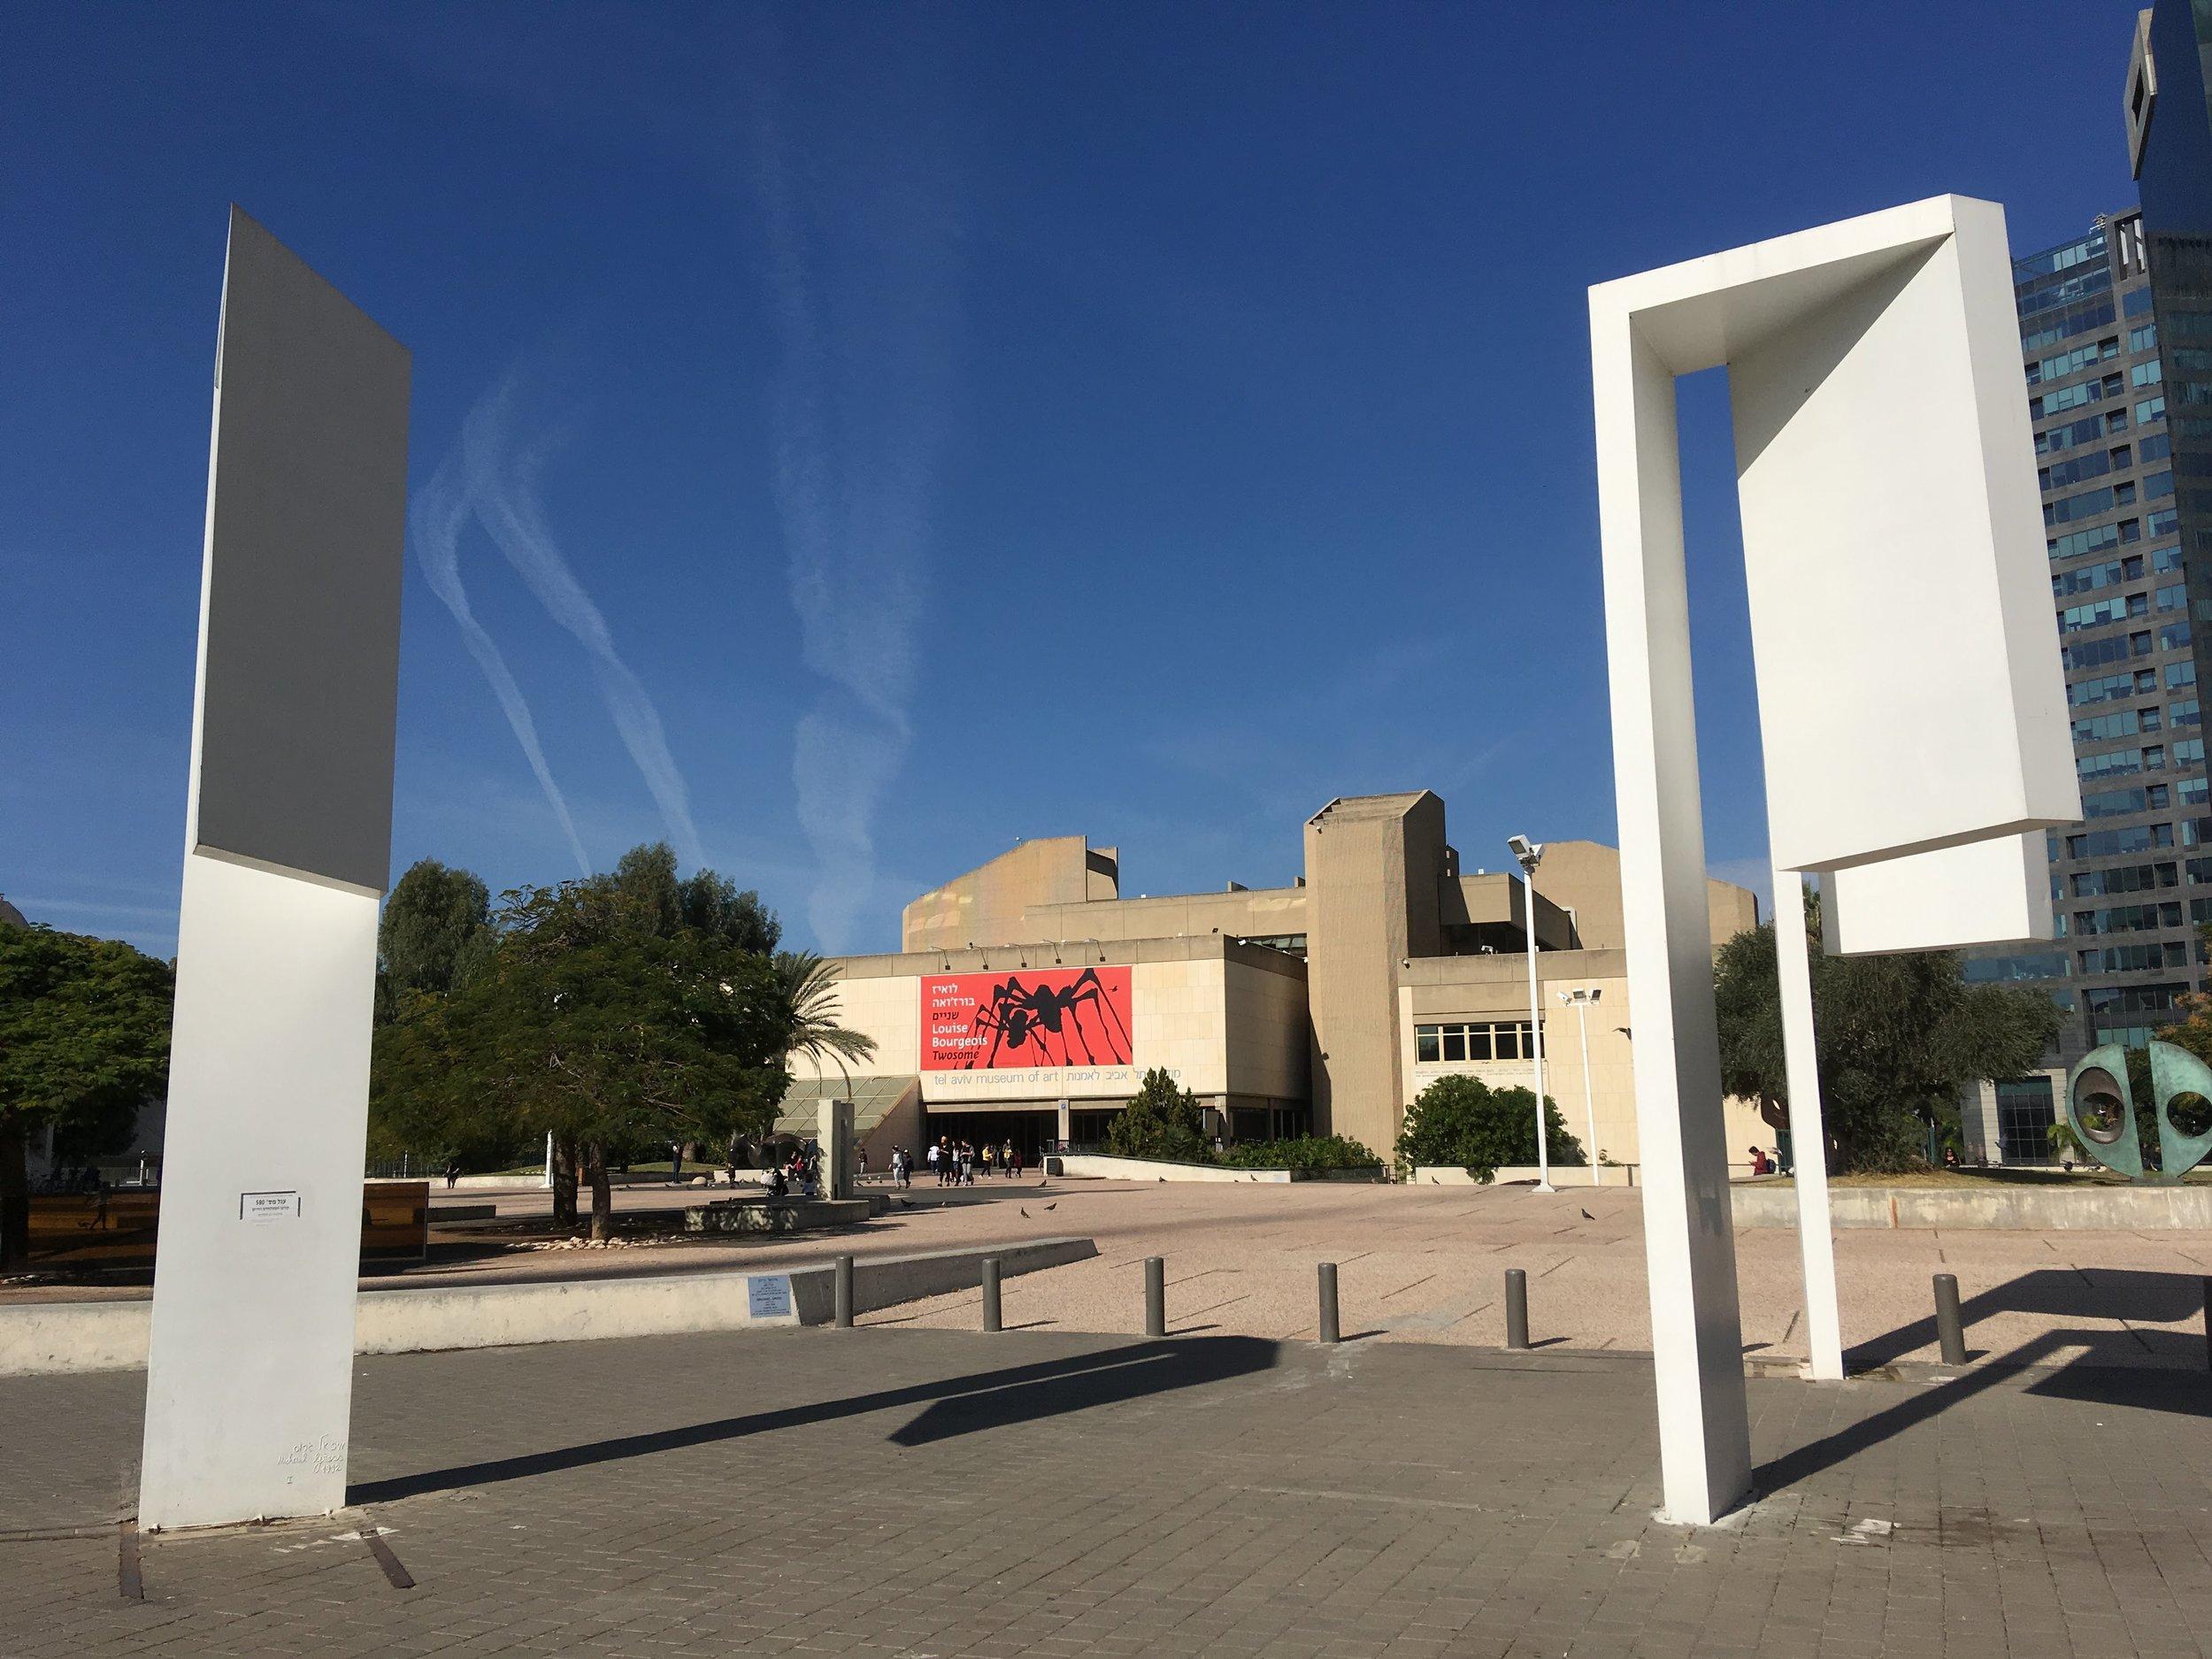 An overarching exhibition. Tel Aviv Museum of Art